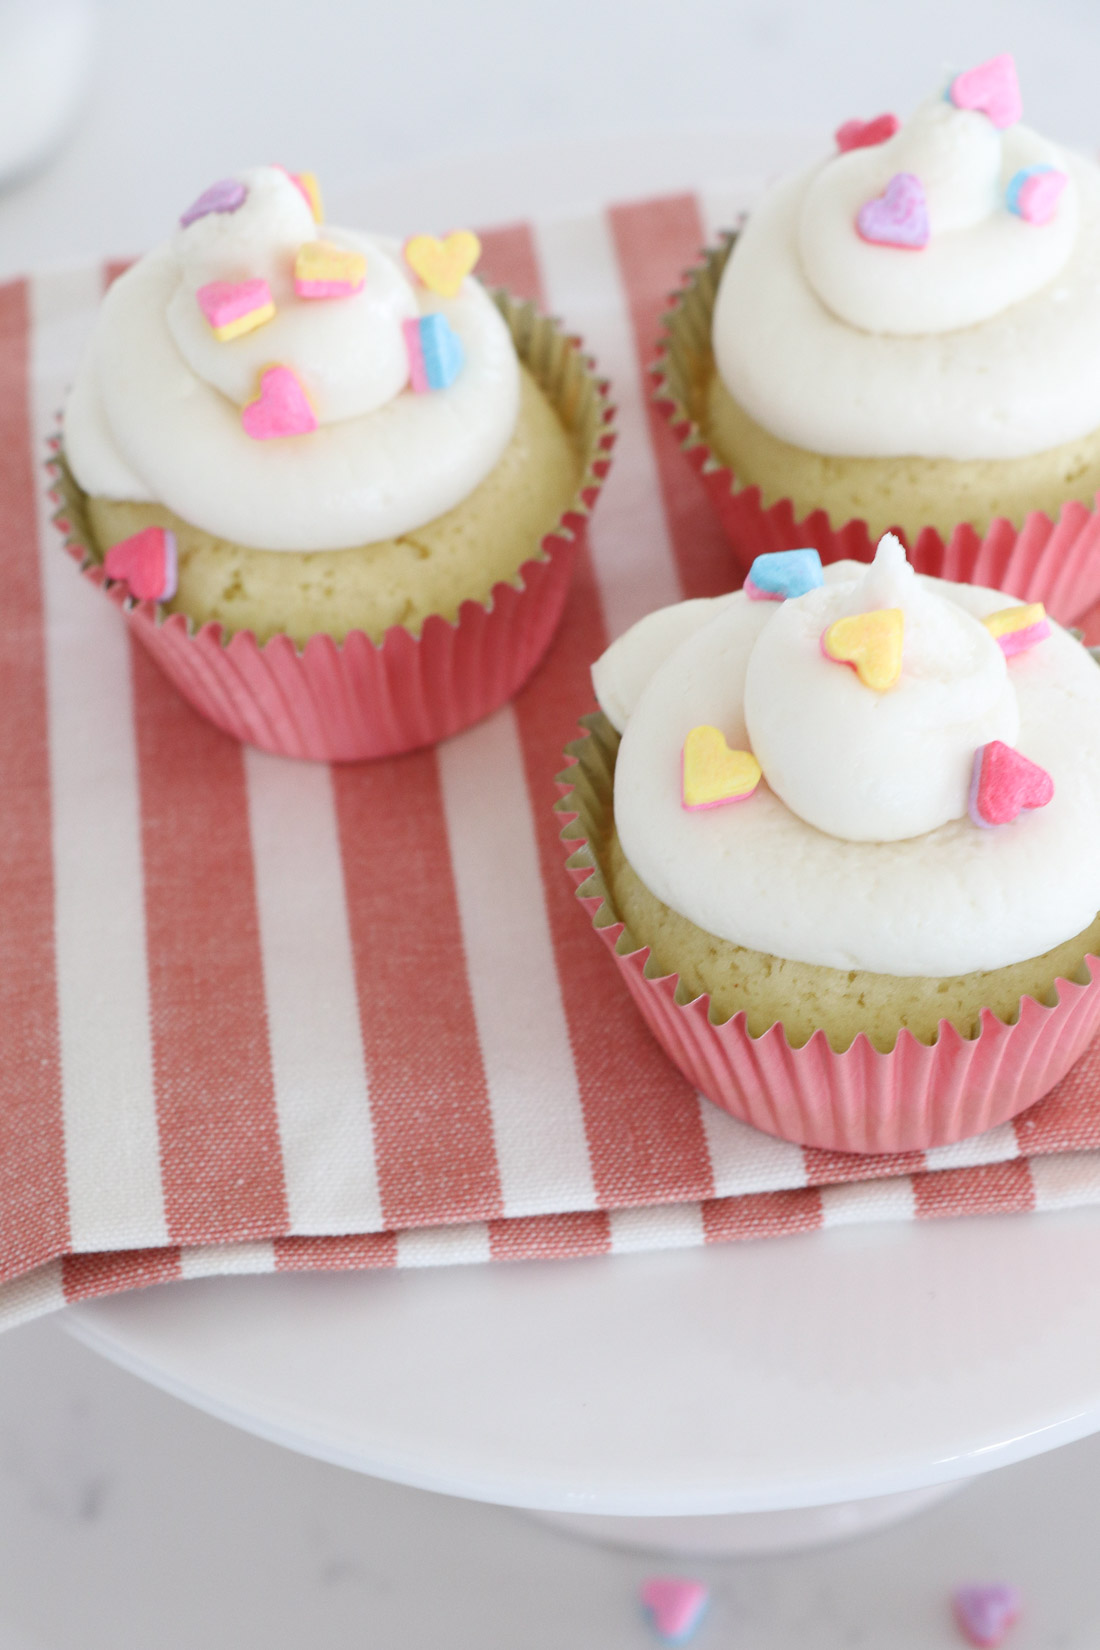 Dairy Free Vanilla Icing and Cupcakes